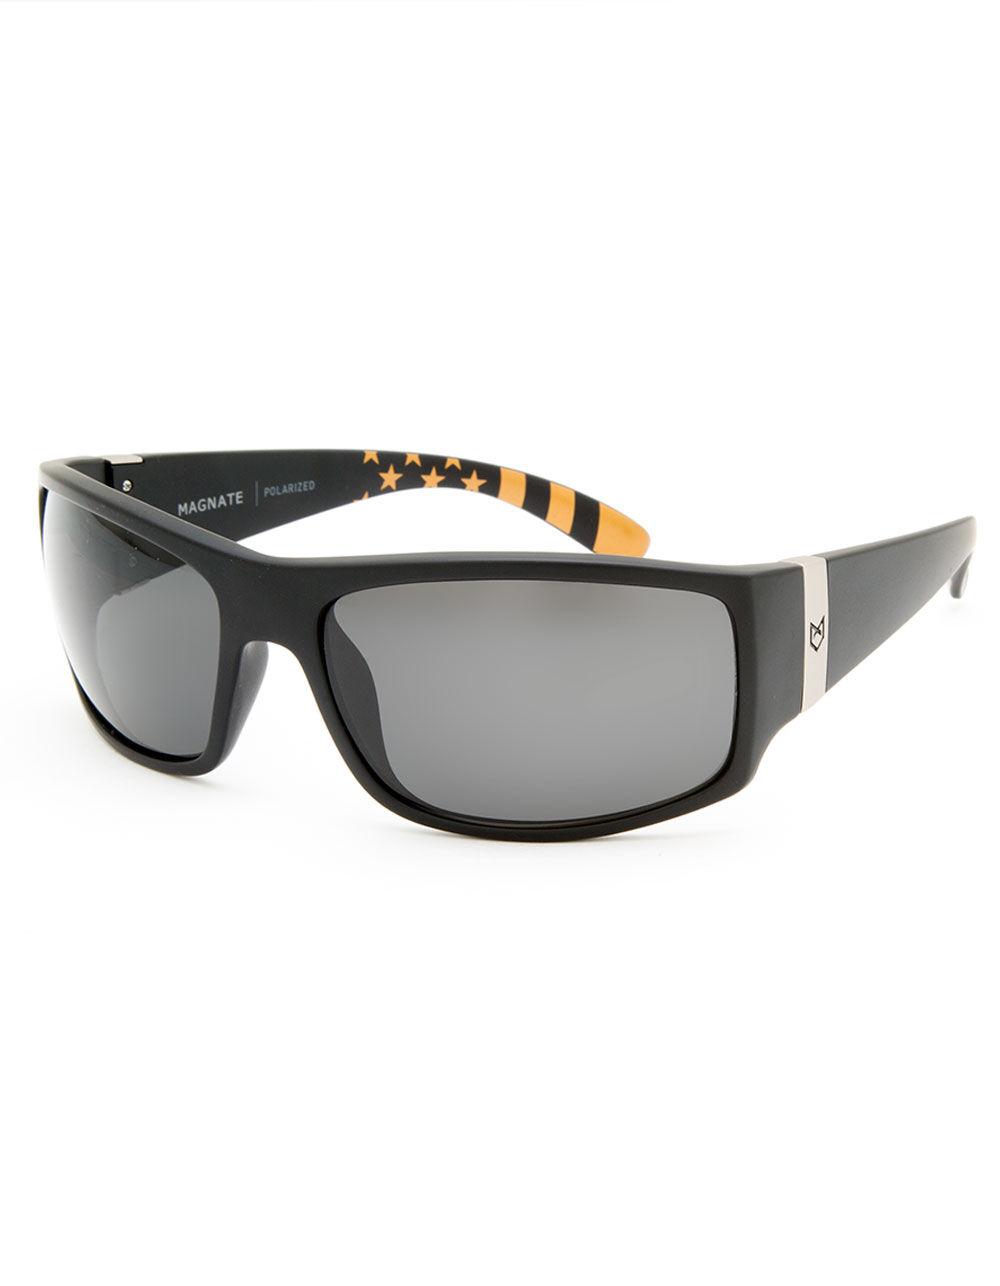 MADSON Magnate Polarized Sunglasses